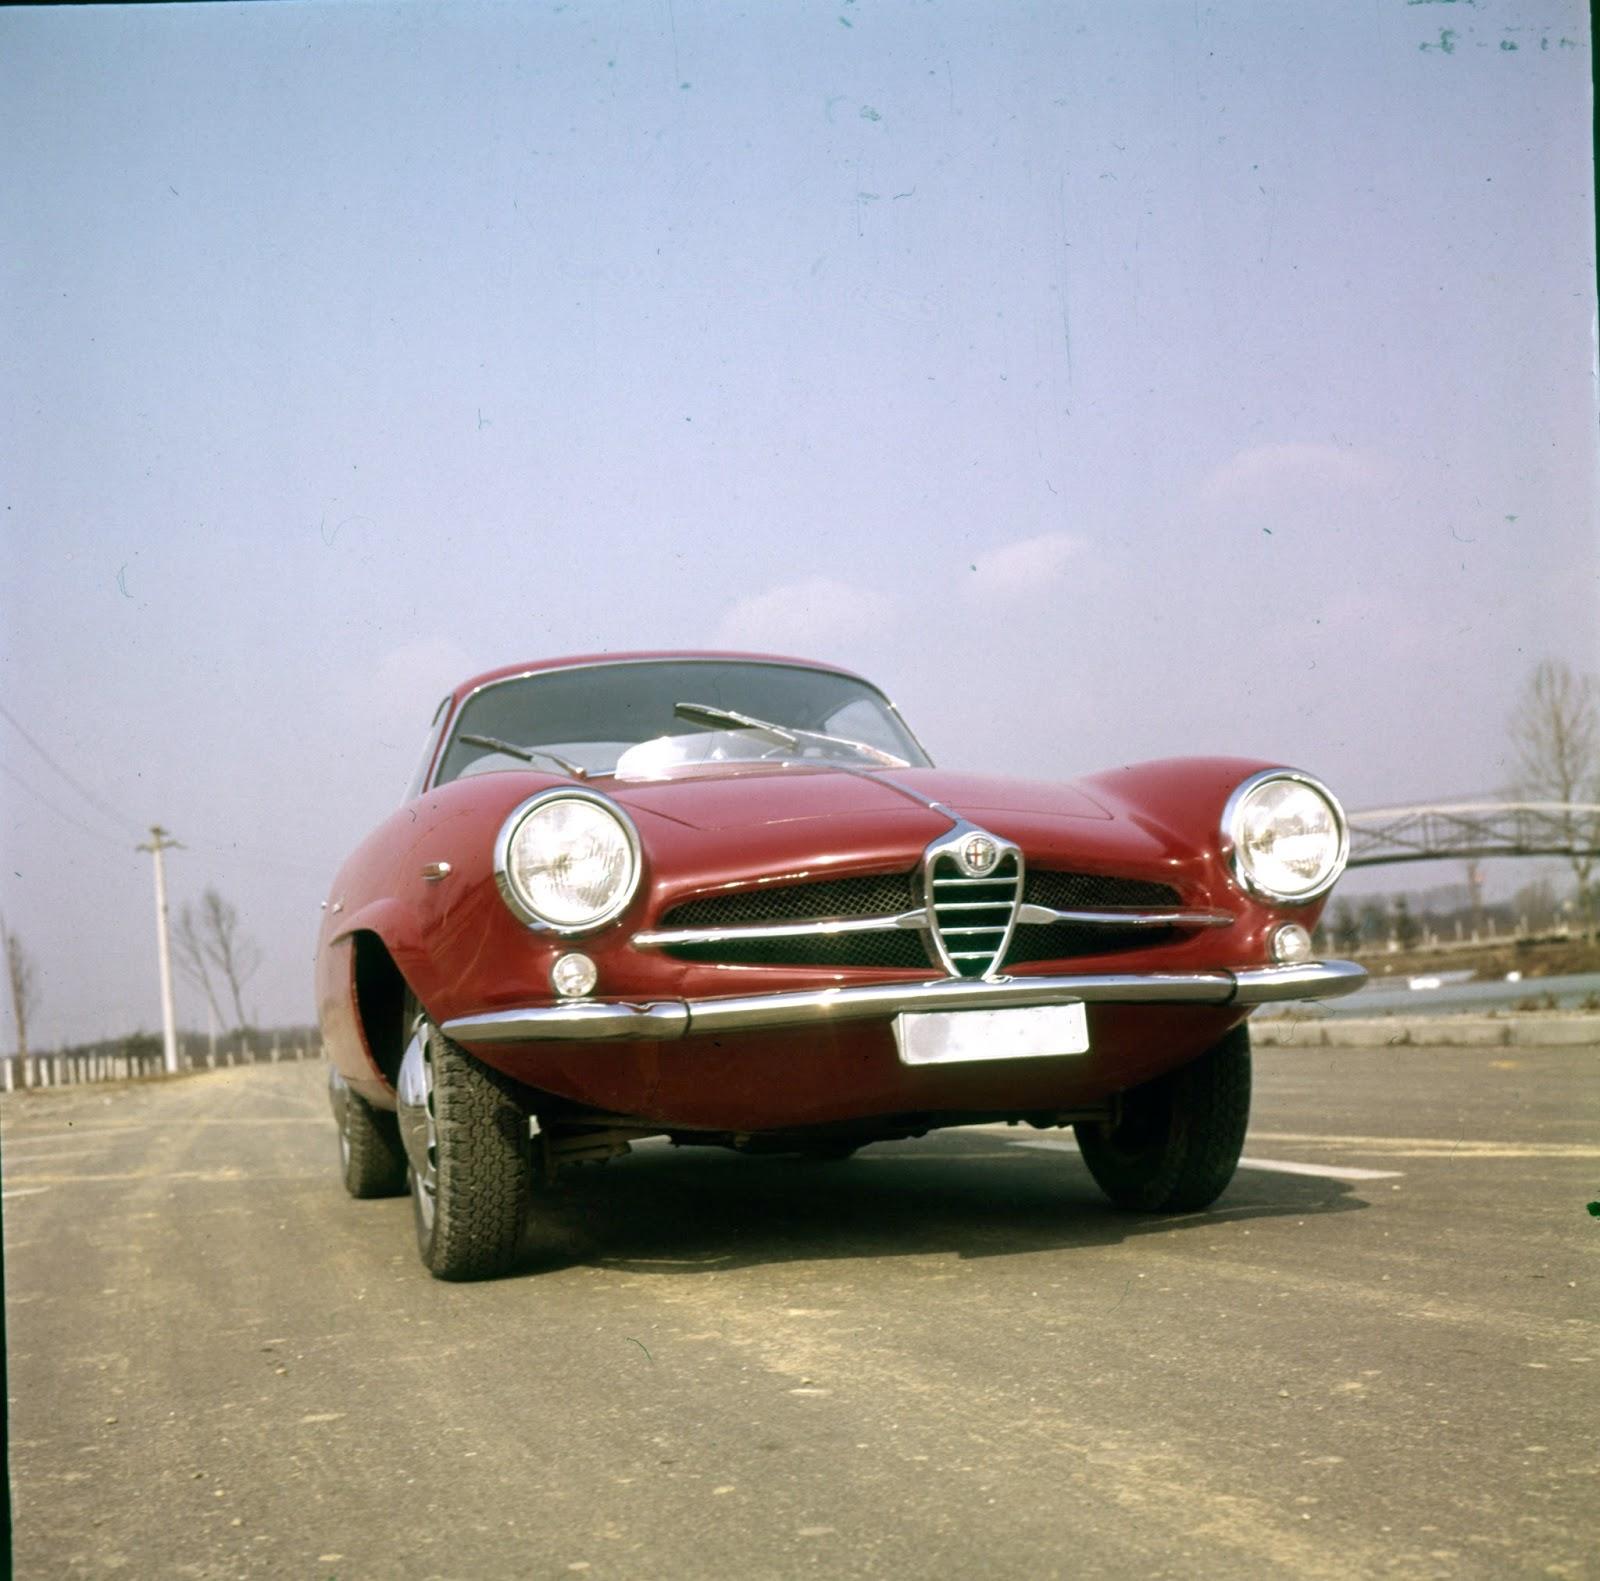 170413 Heritage Targa Florio 02 Τα ιστορικά μοντέλα της FCA επιστρέφουν στο Targa Florio Abarth, alfa romeo, Classic, Fiat, Lancia